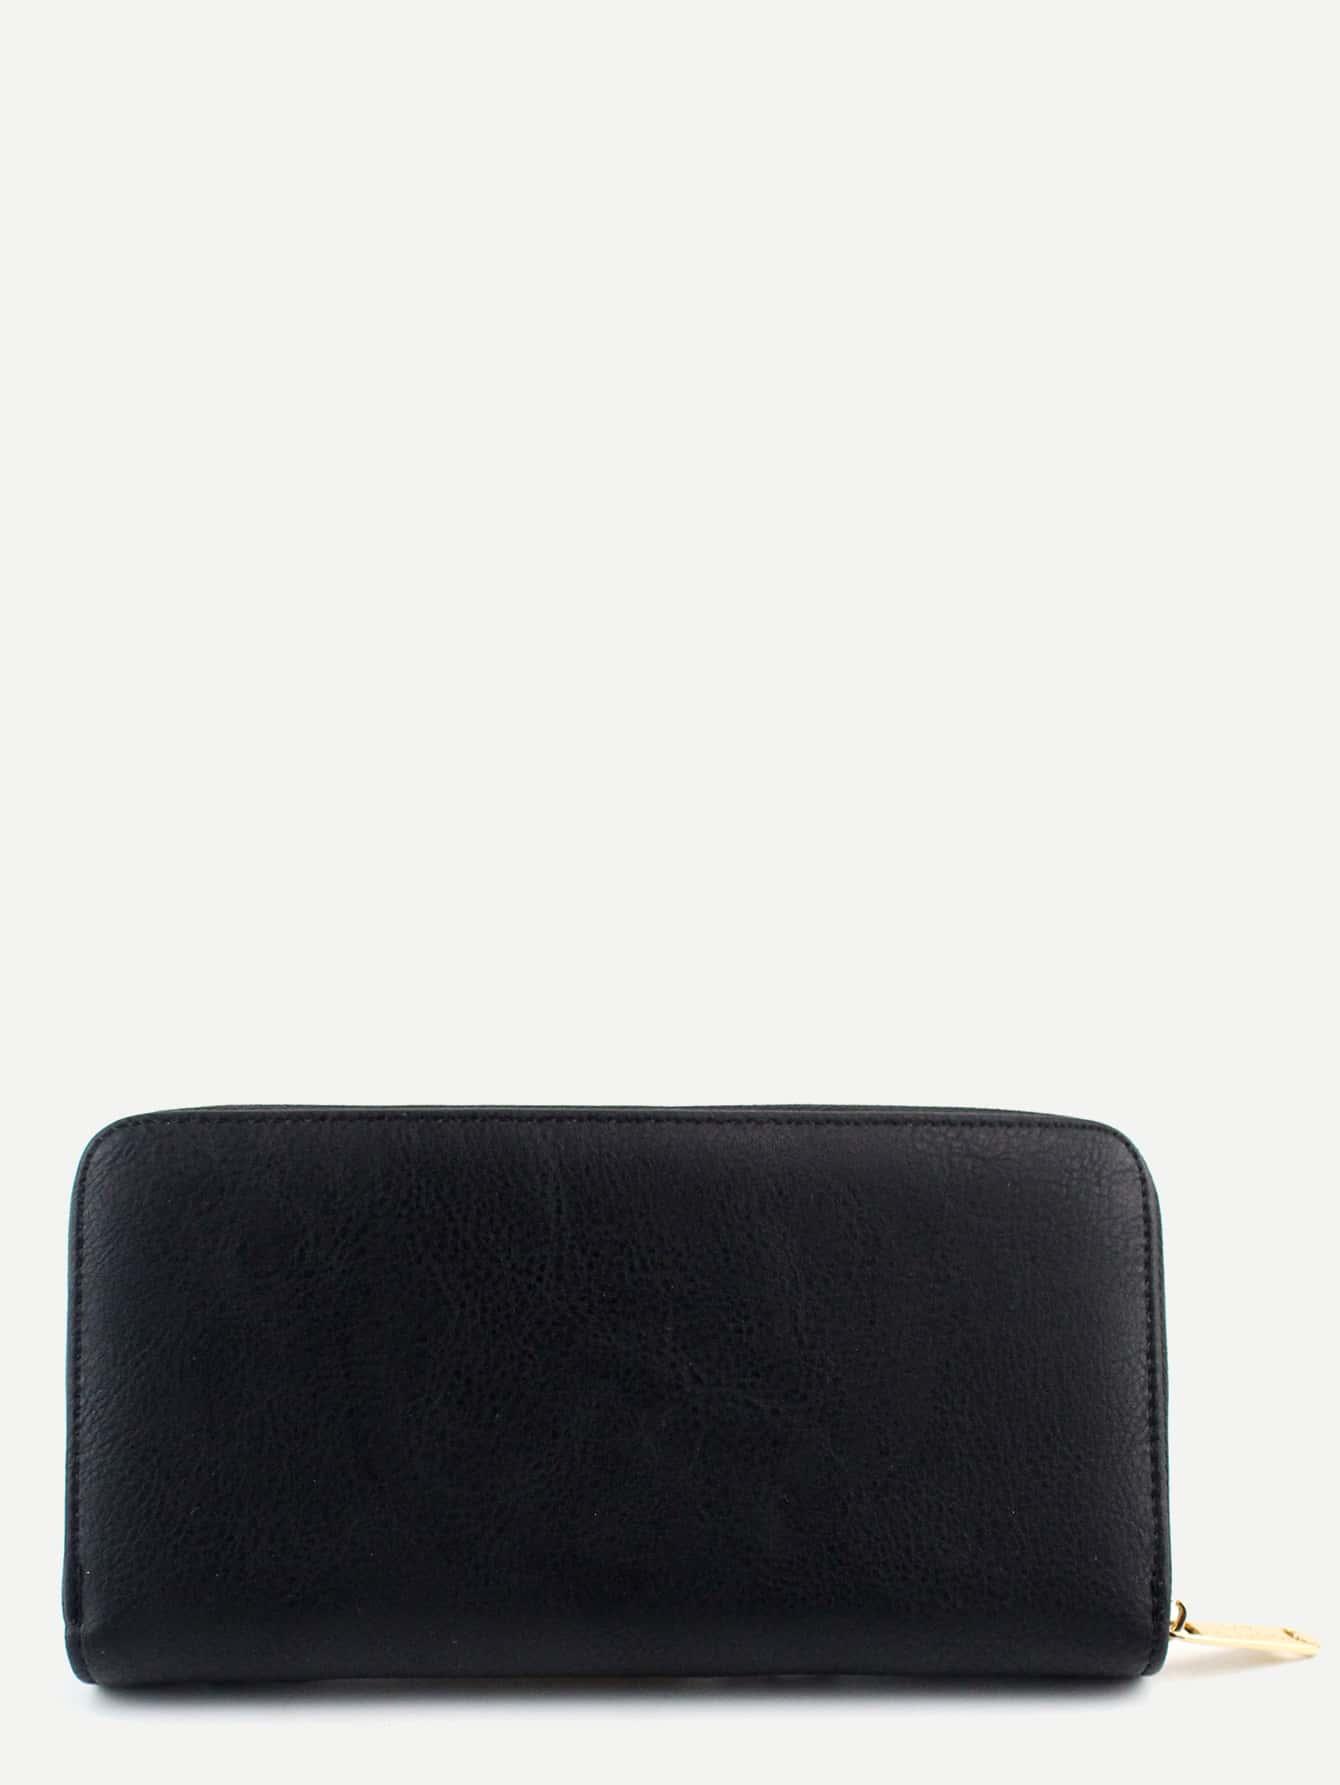 bag161013311_2